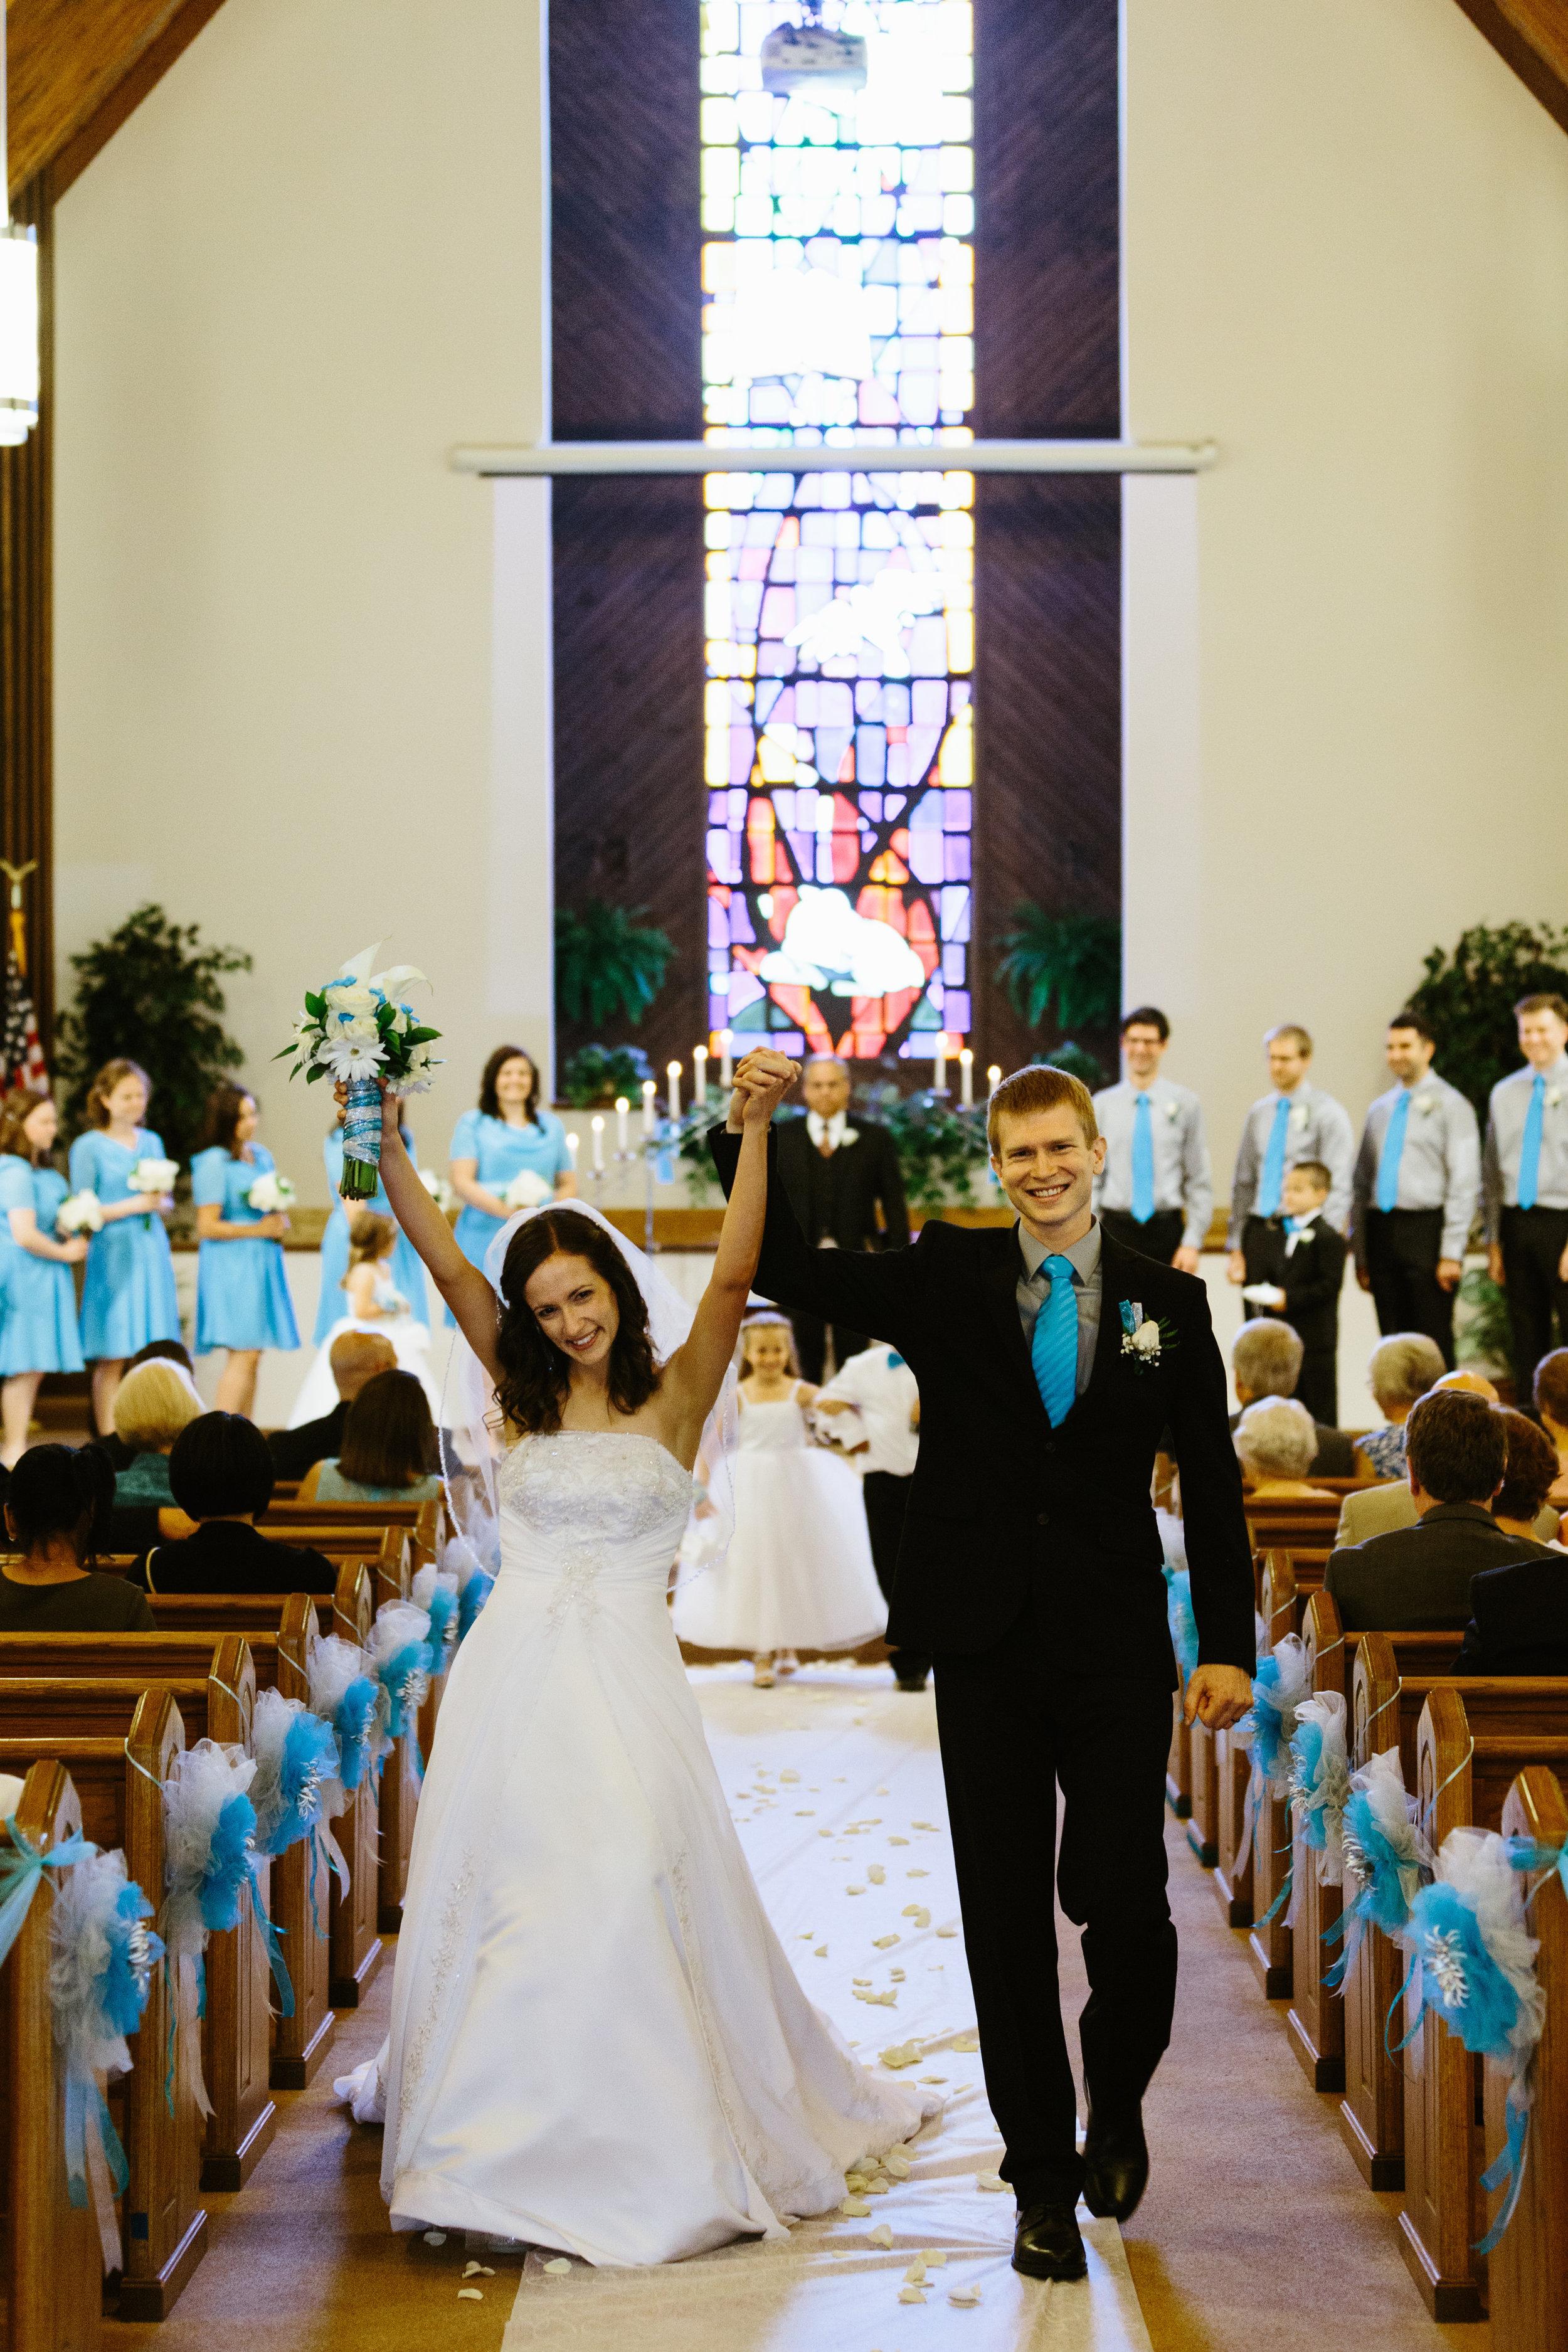 Teller-Payich Wedding-290.jpg